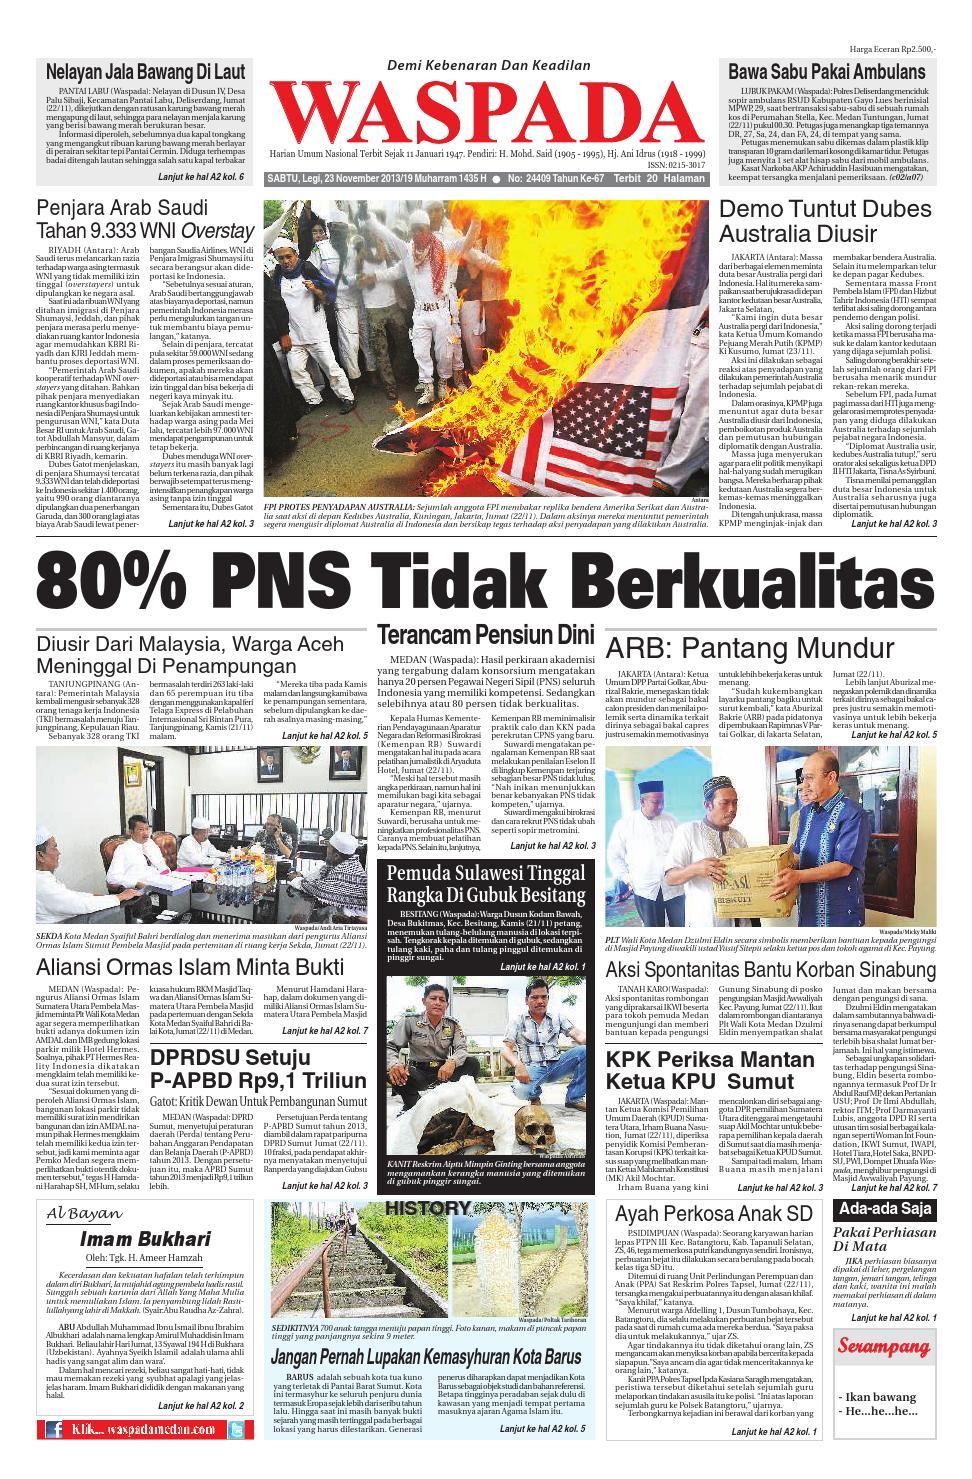 Waspadasabtu 23 November 2013 By Harian Waspada Issuu Rkb Tegal Produk Ukm Bumn Emping Ubi